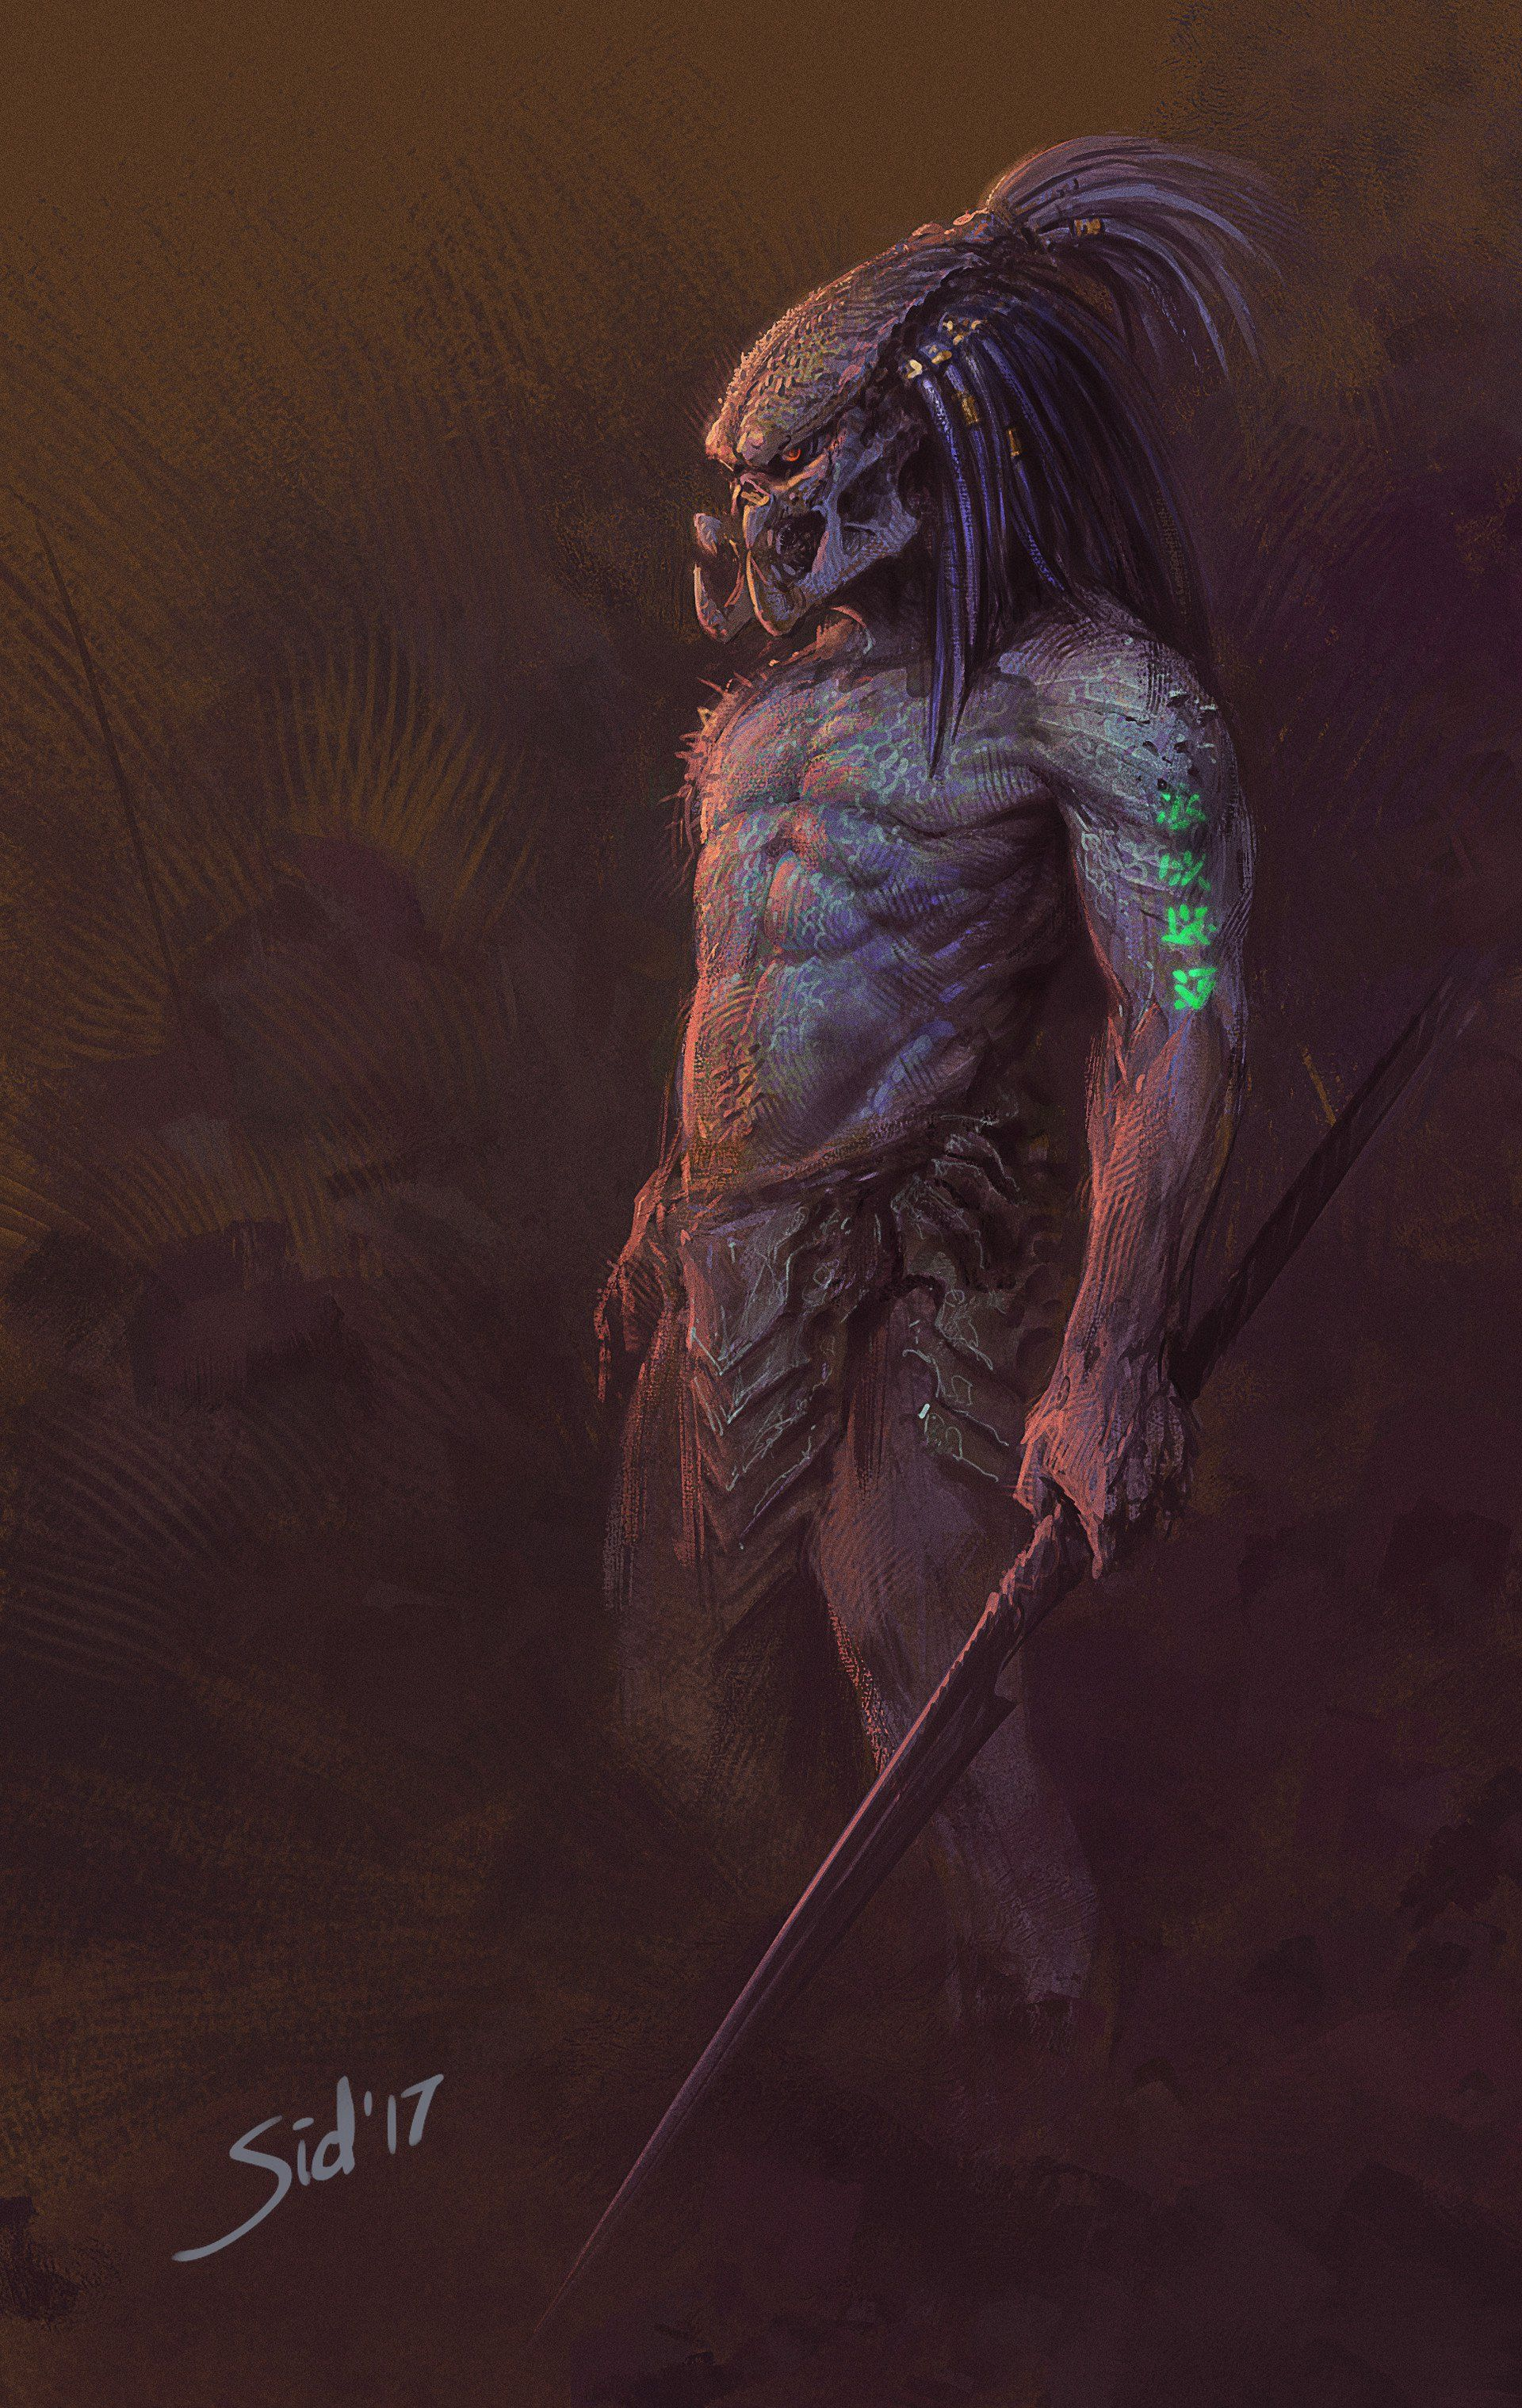 51 Deadliest Predator Tattoo Designs Ideas For Men: Predator Movie, Predator Alien Art